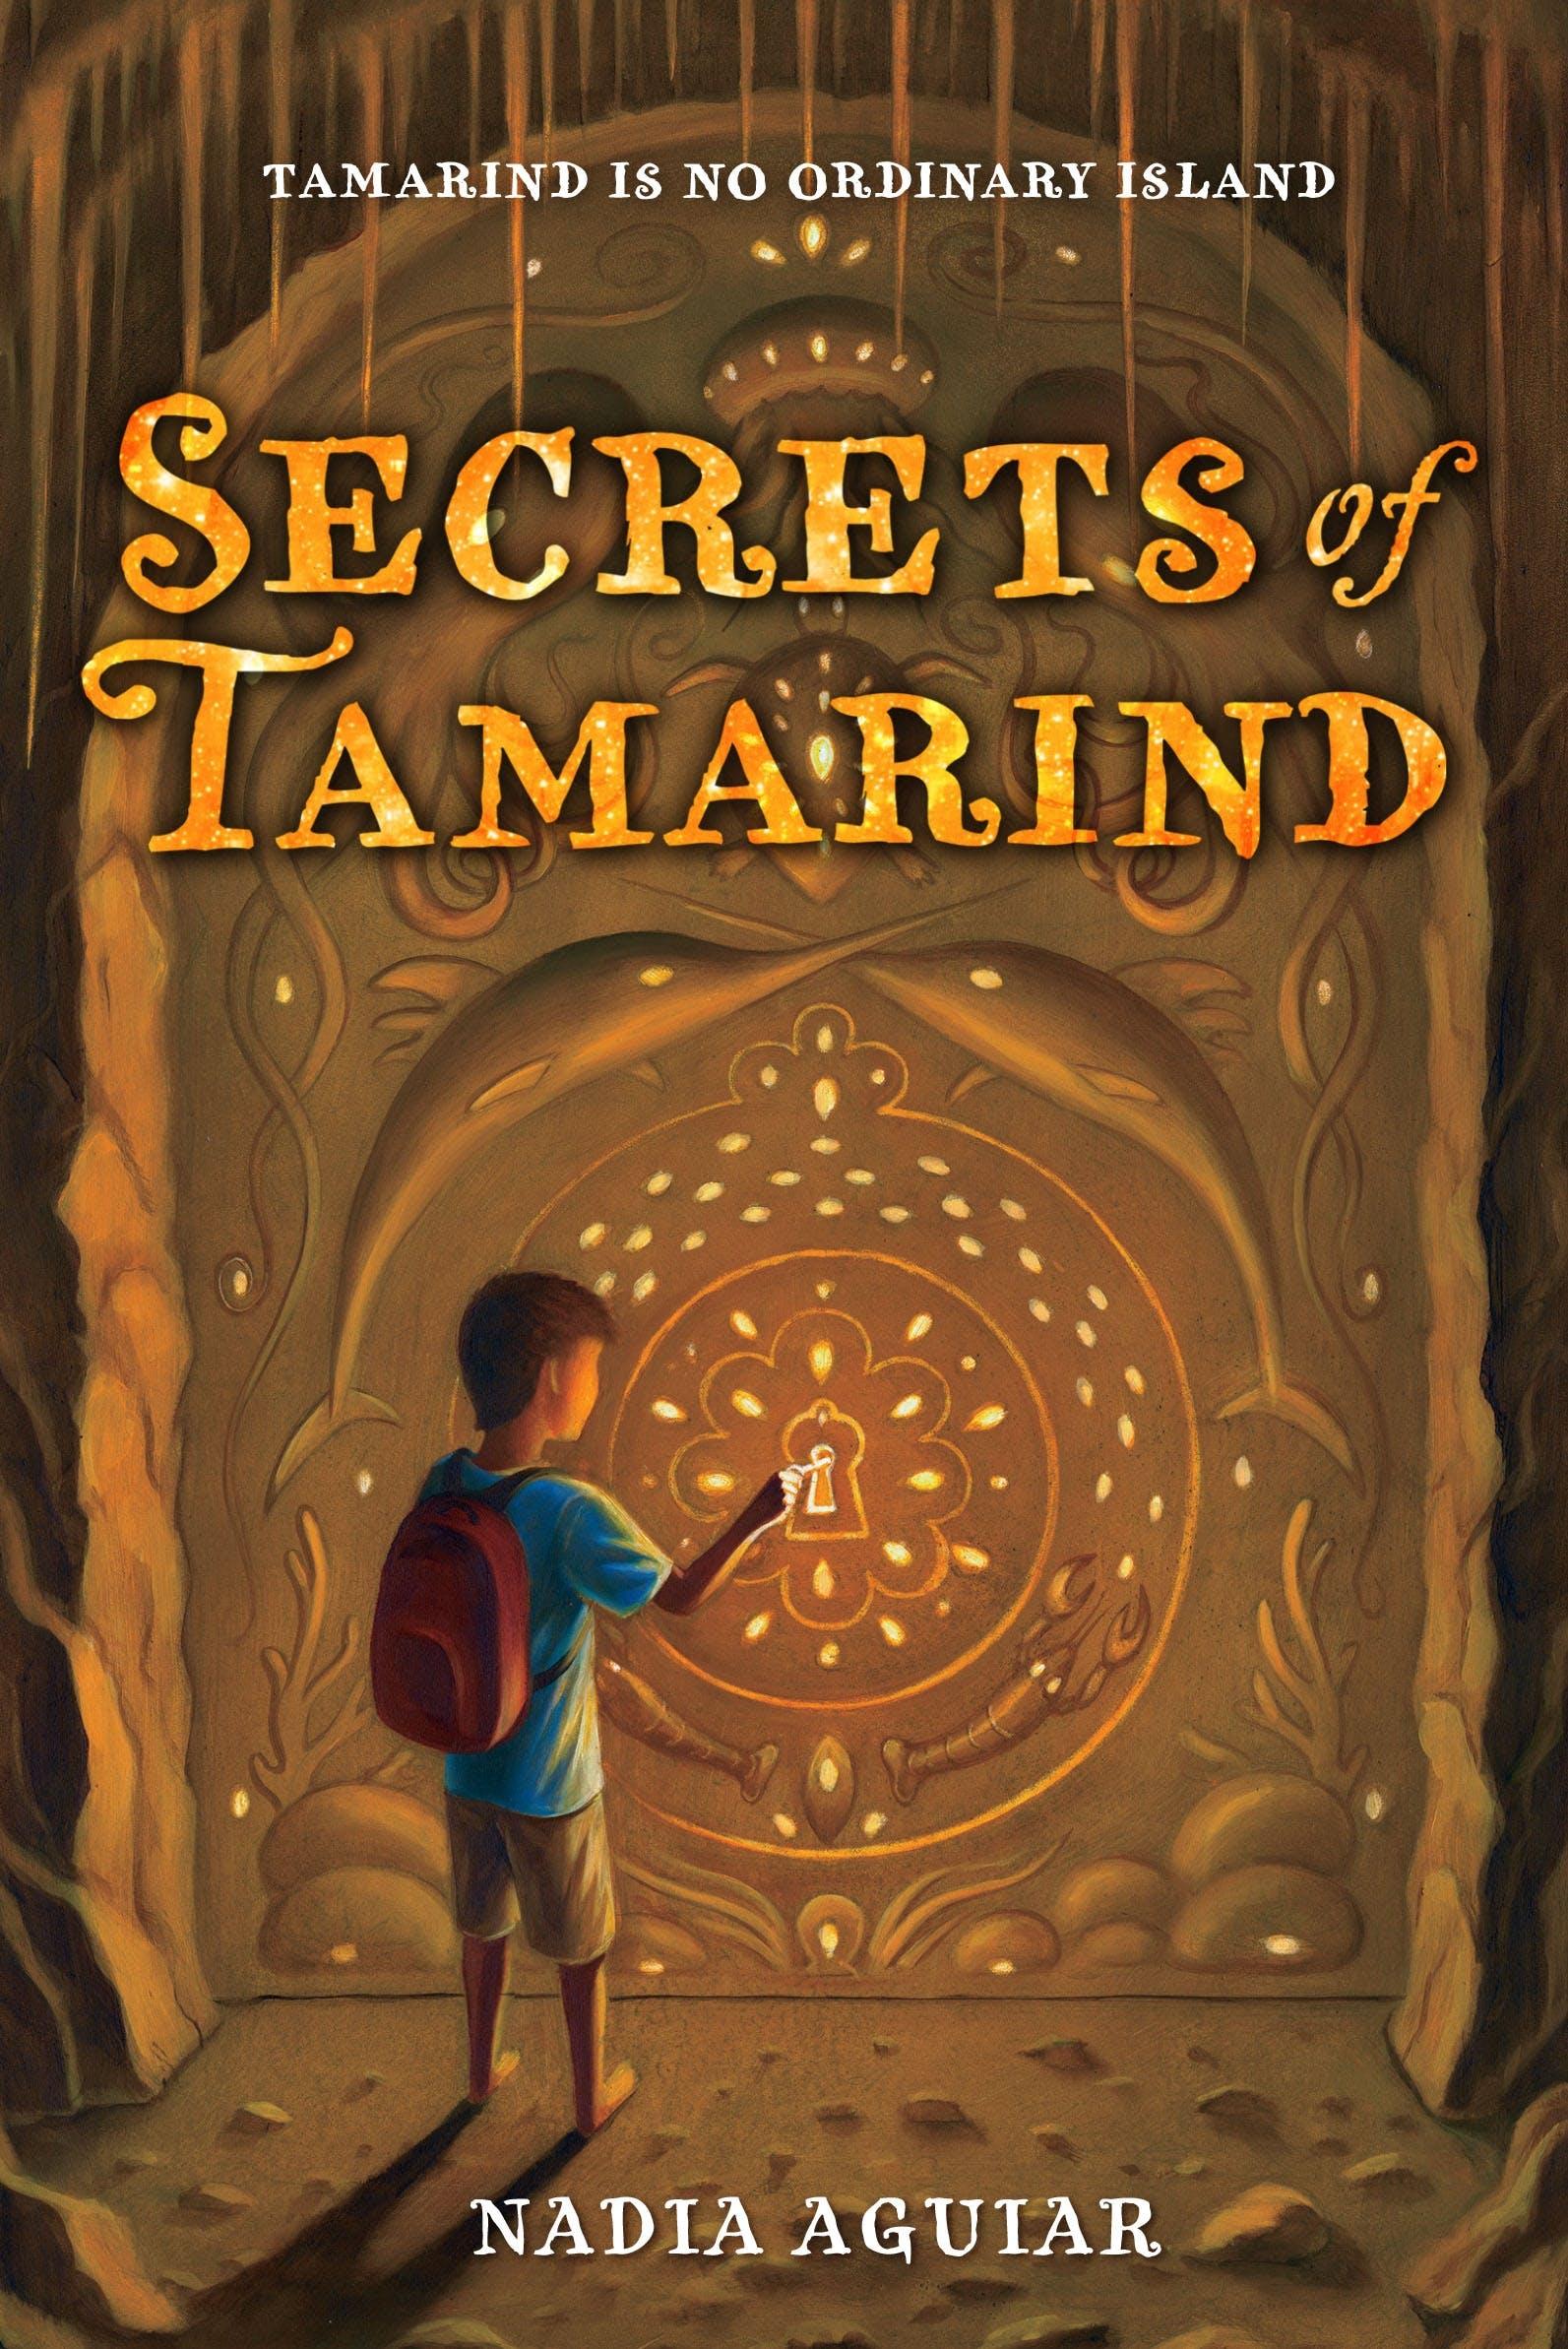 Image of Secrets of Tamarind